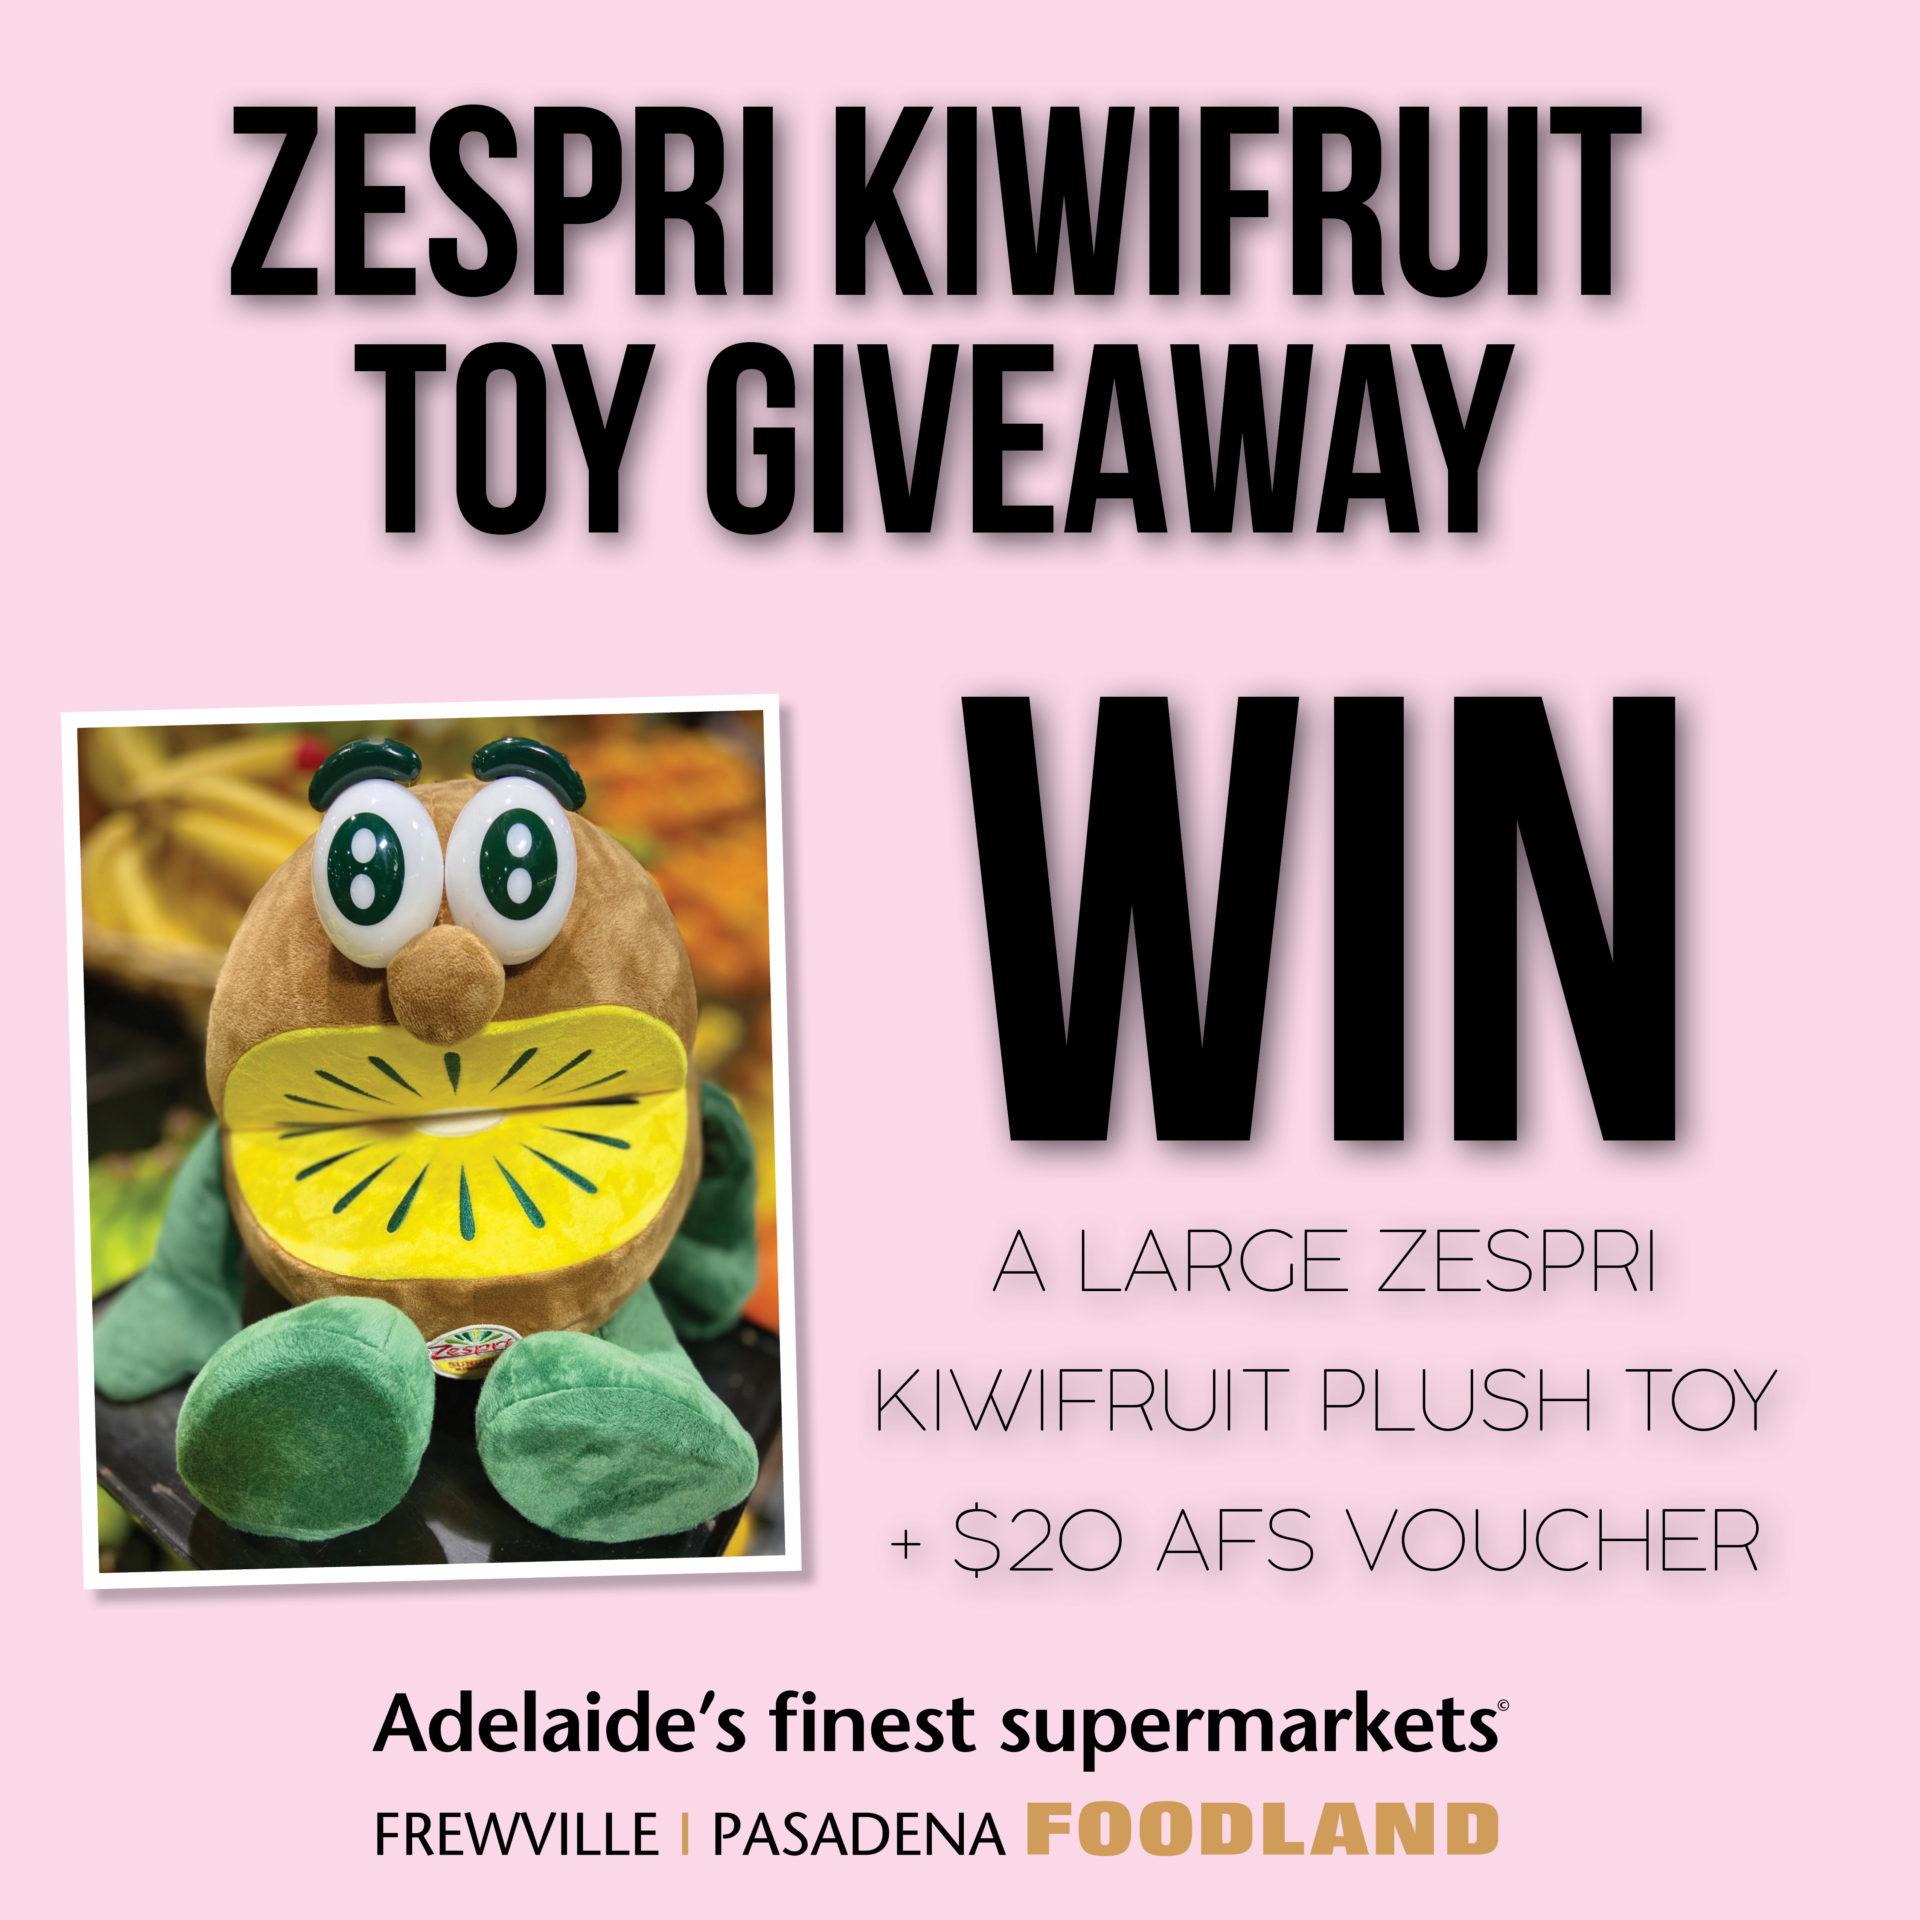 Zespri Kiwifruit Toy Giveaway